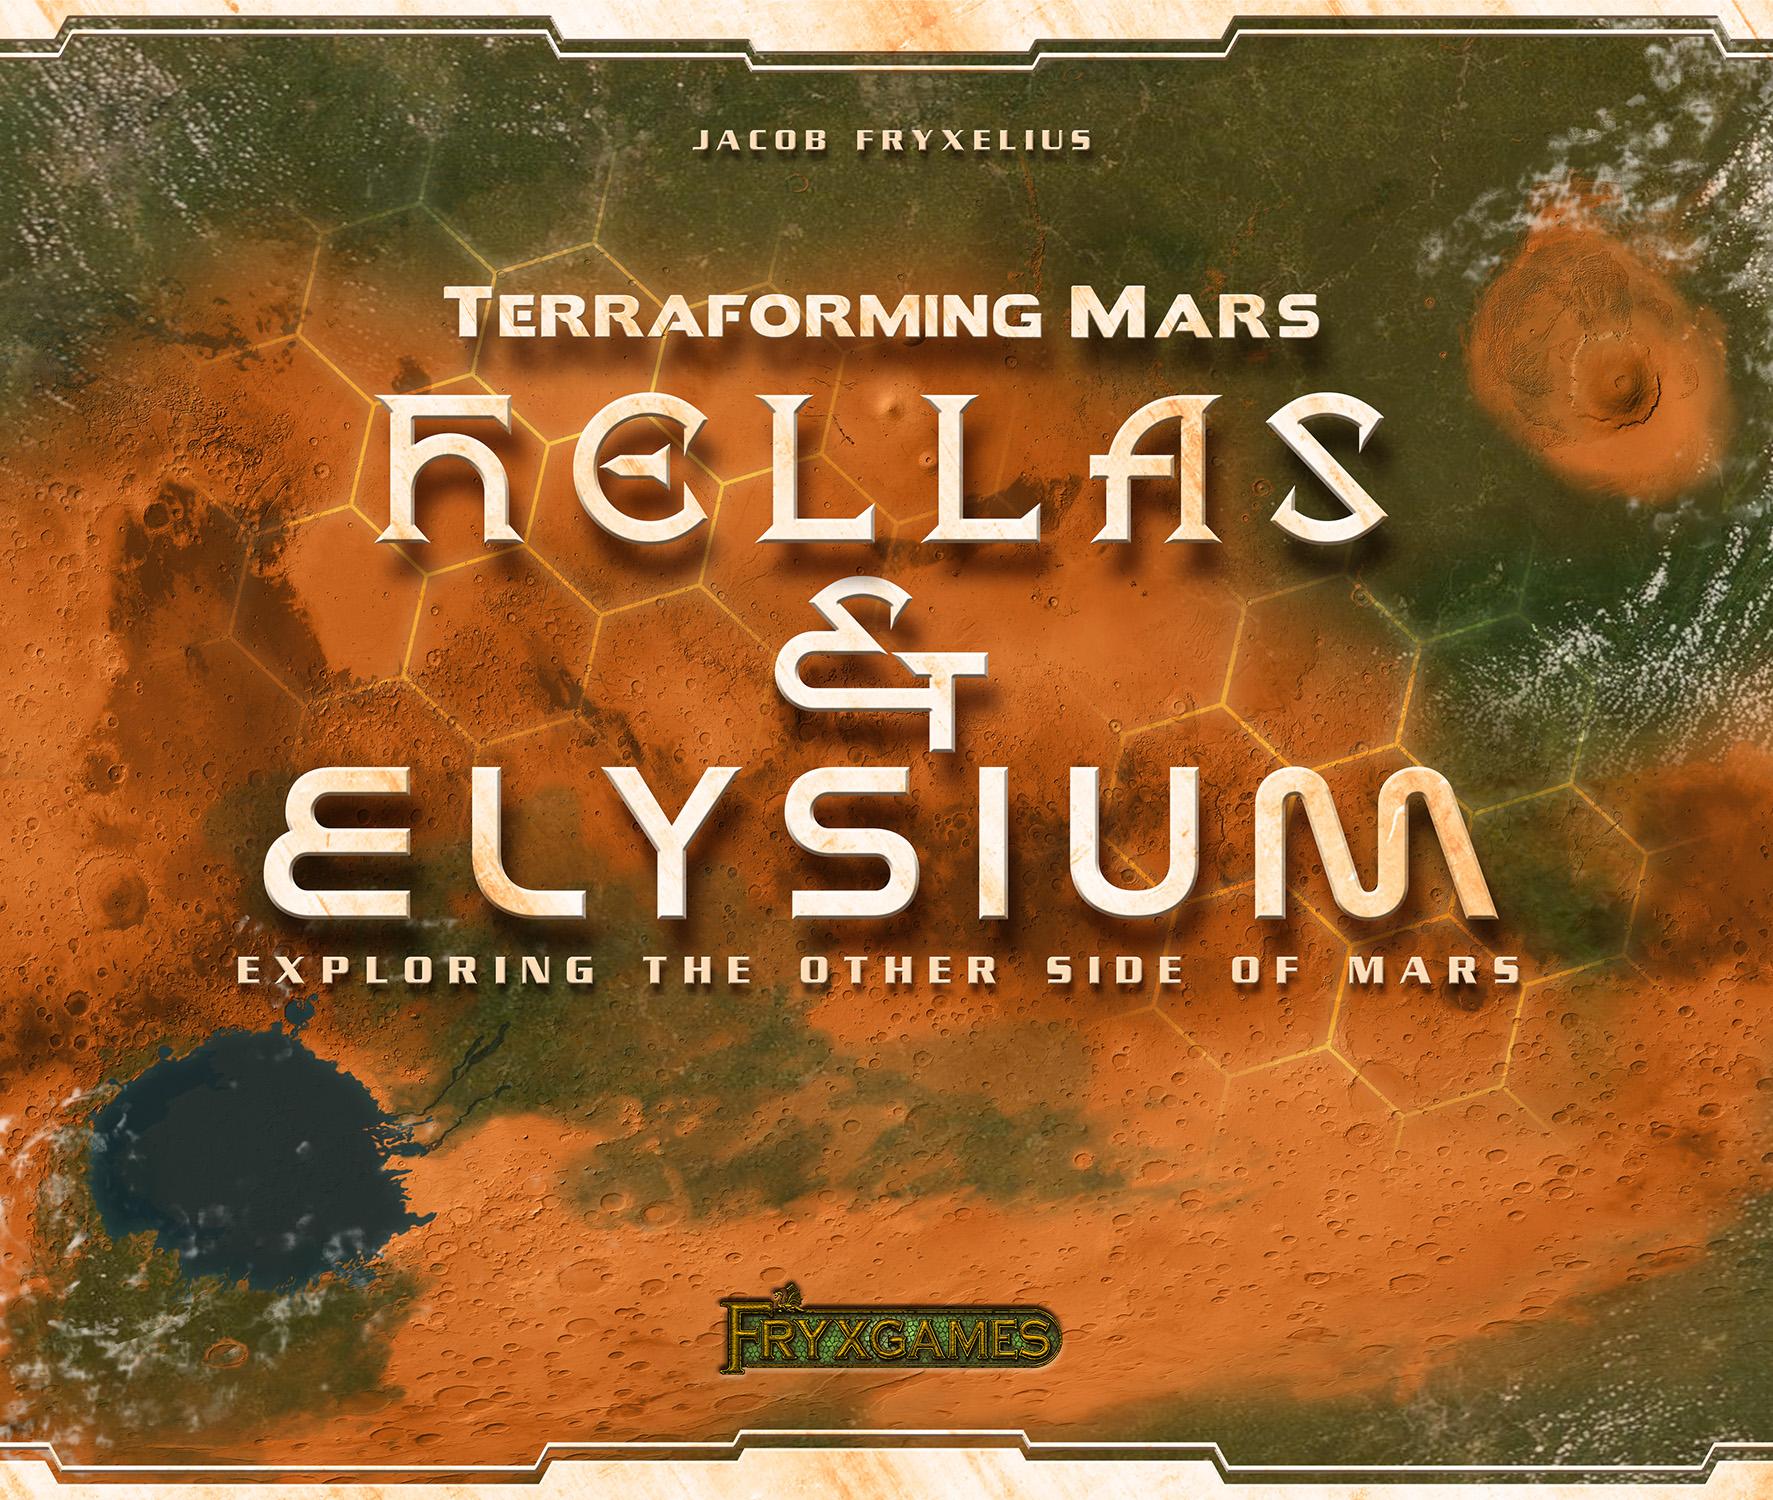 Terraforming Mars (NL) + Hellas & Elysium (NL) Bundle